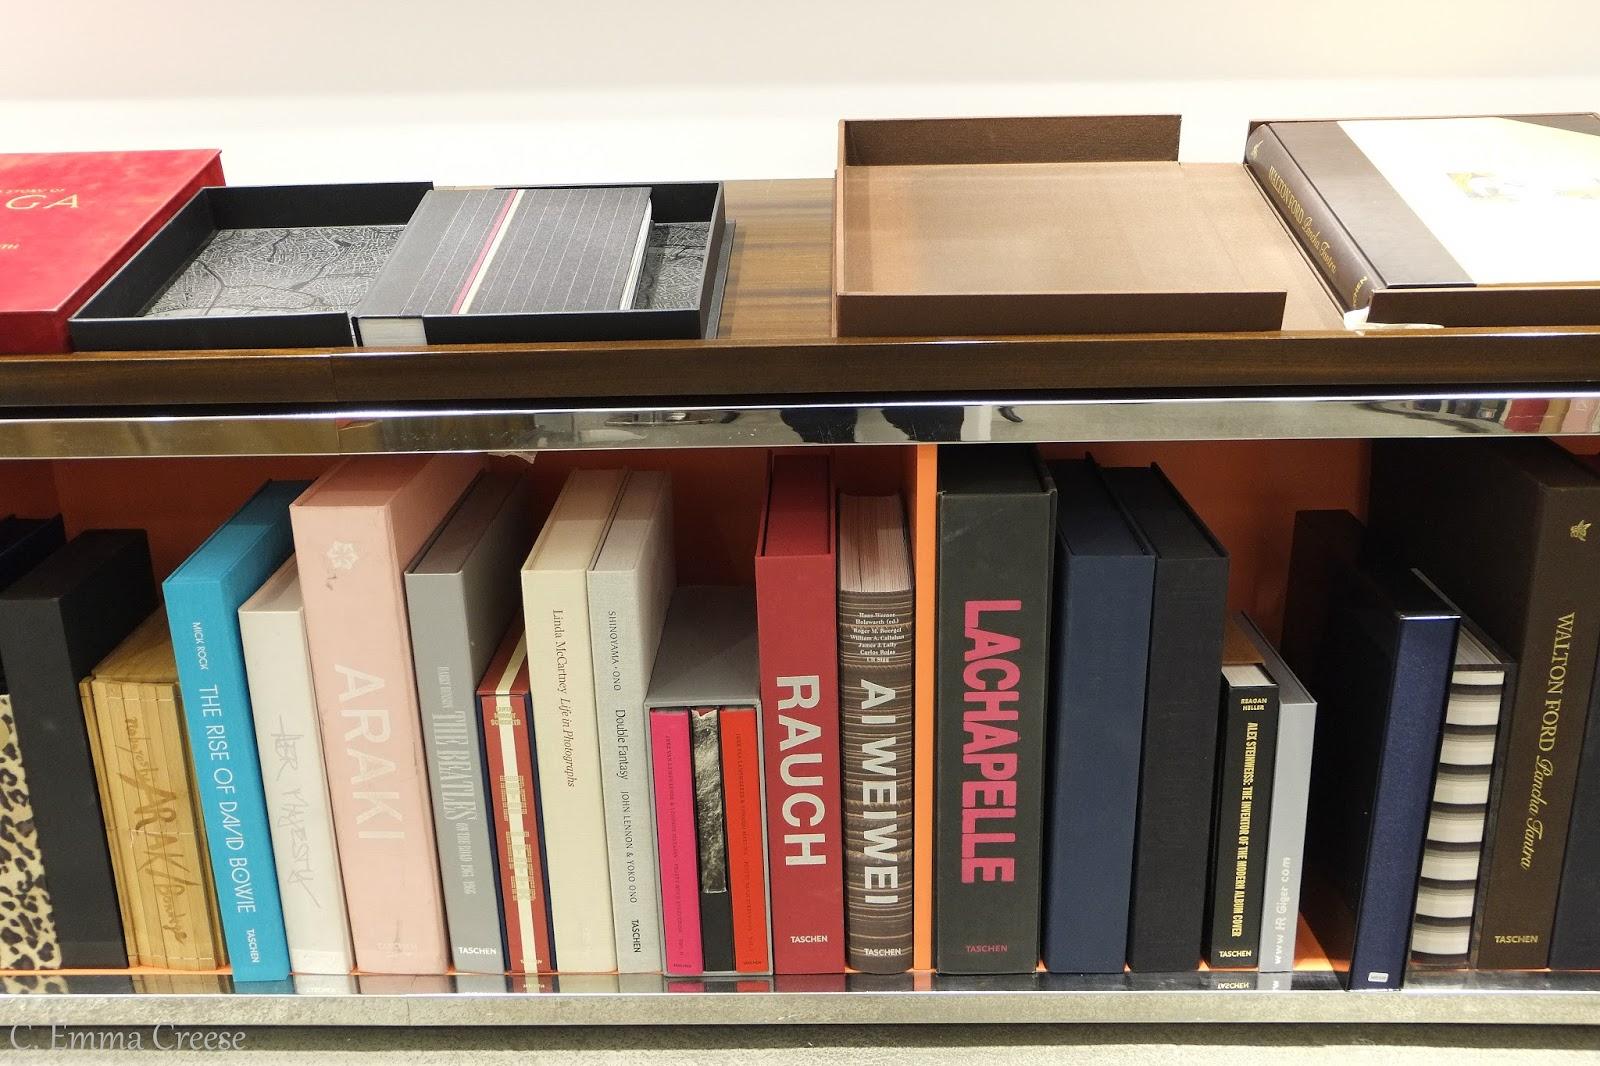 Taschen Bookstore Duke of York Square Adventures of a London Kiwi